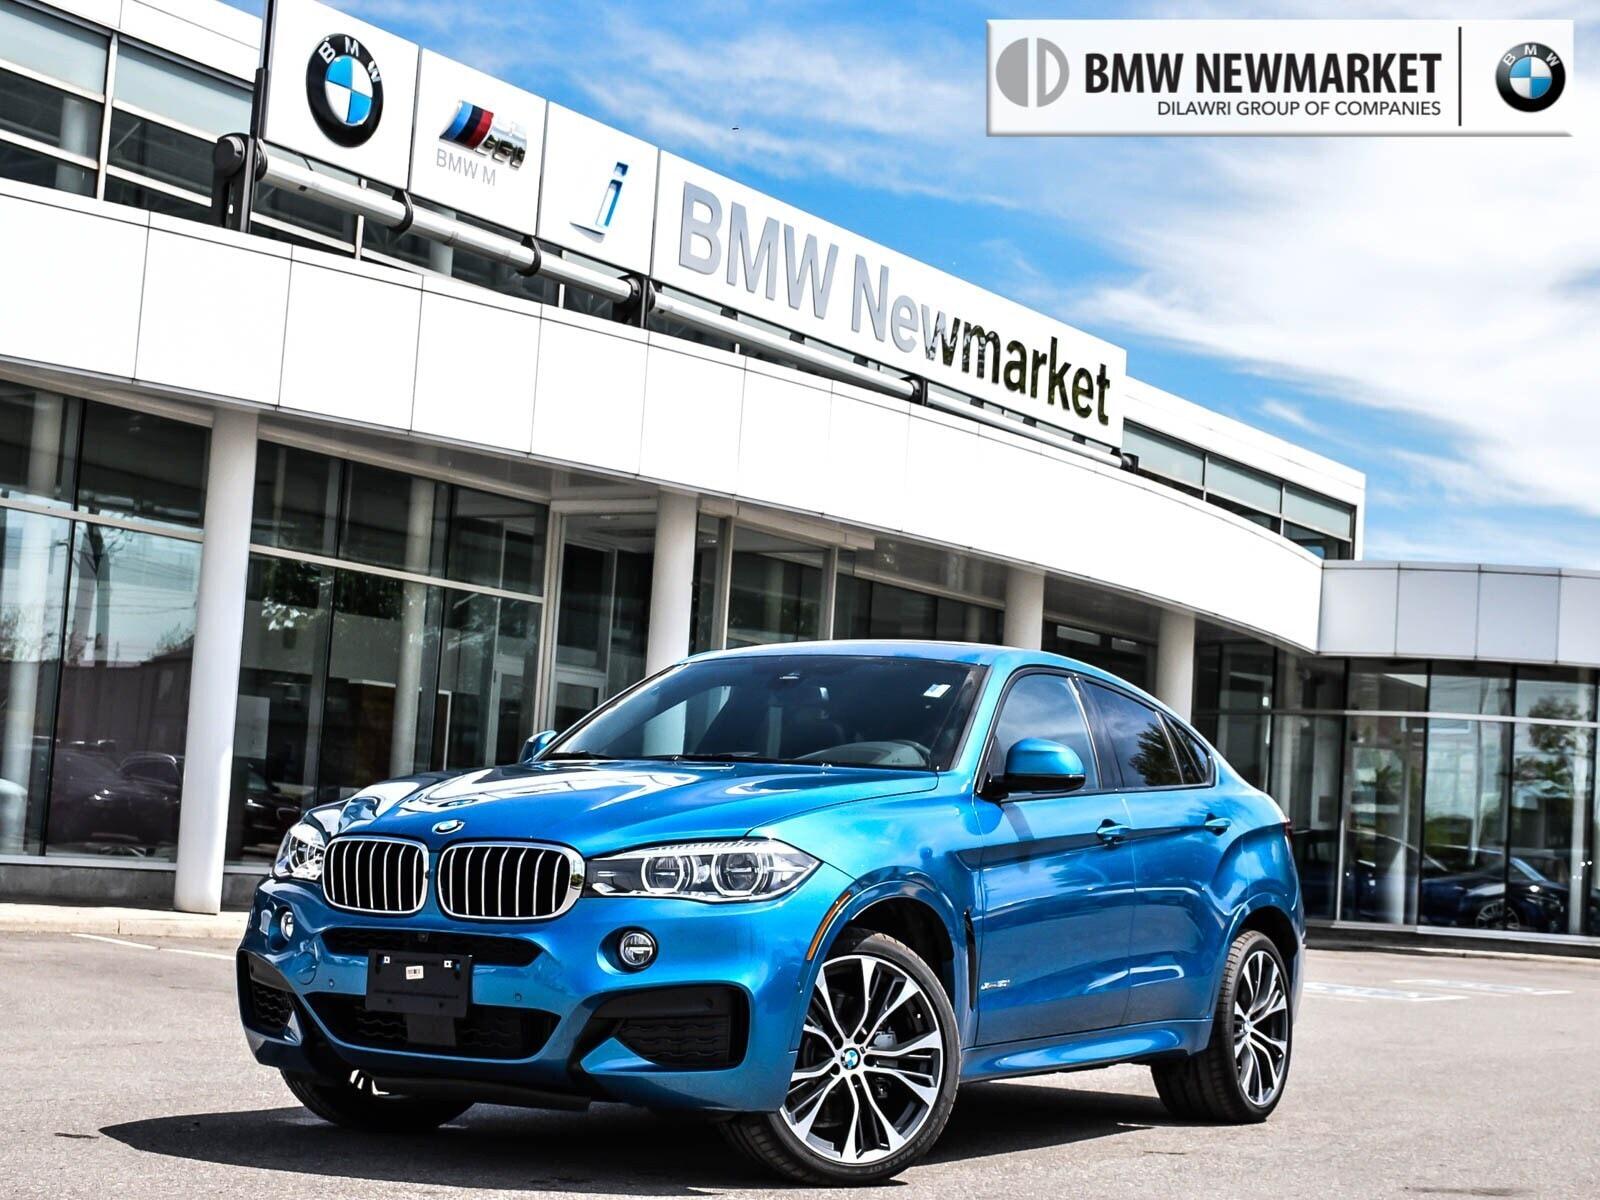 2018 BMW X6 xDrive50i -CLEARANCE PRICE!! M SPORT| SUV